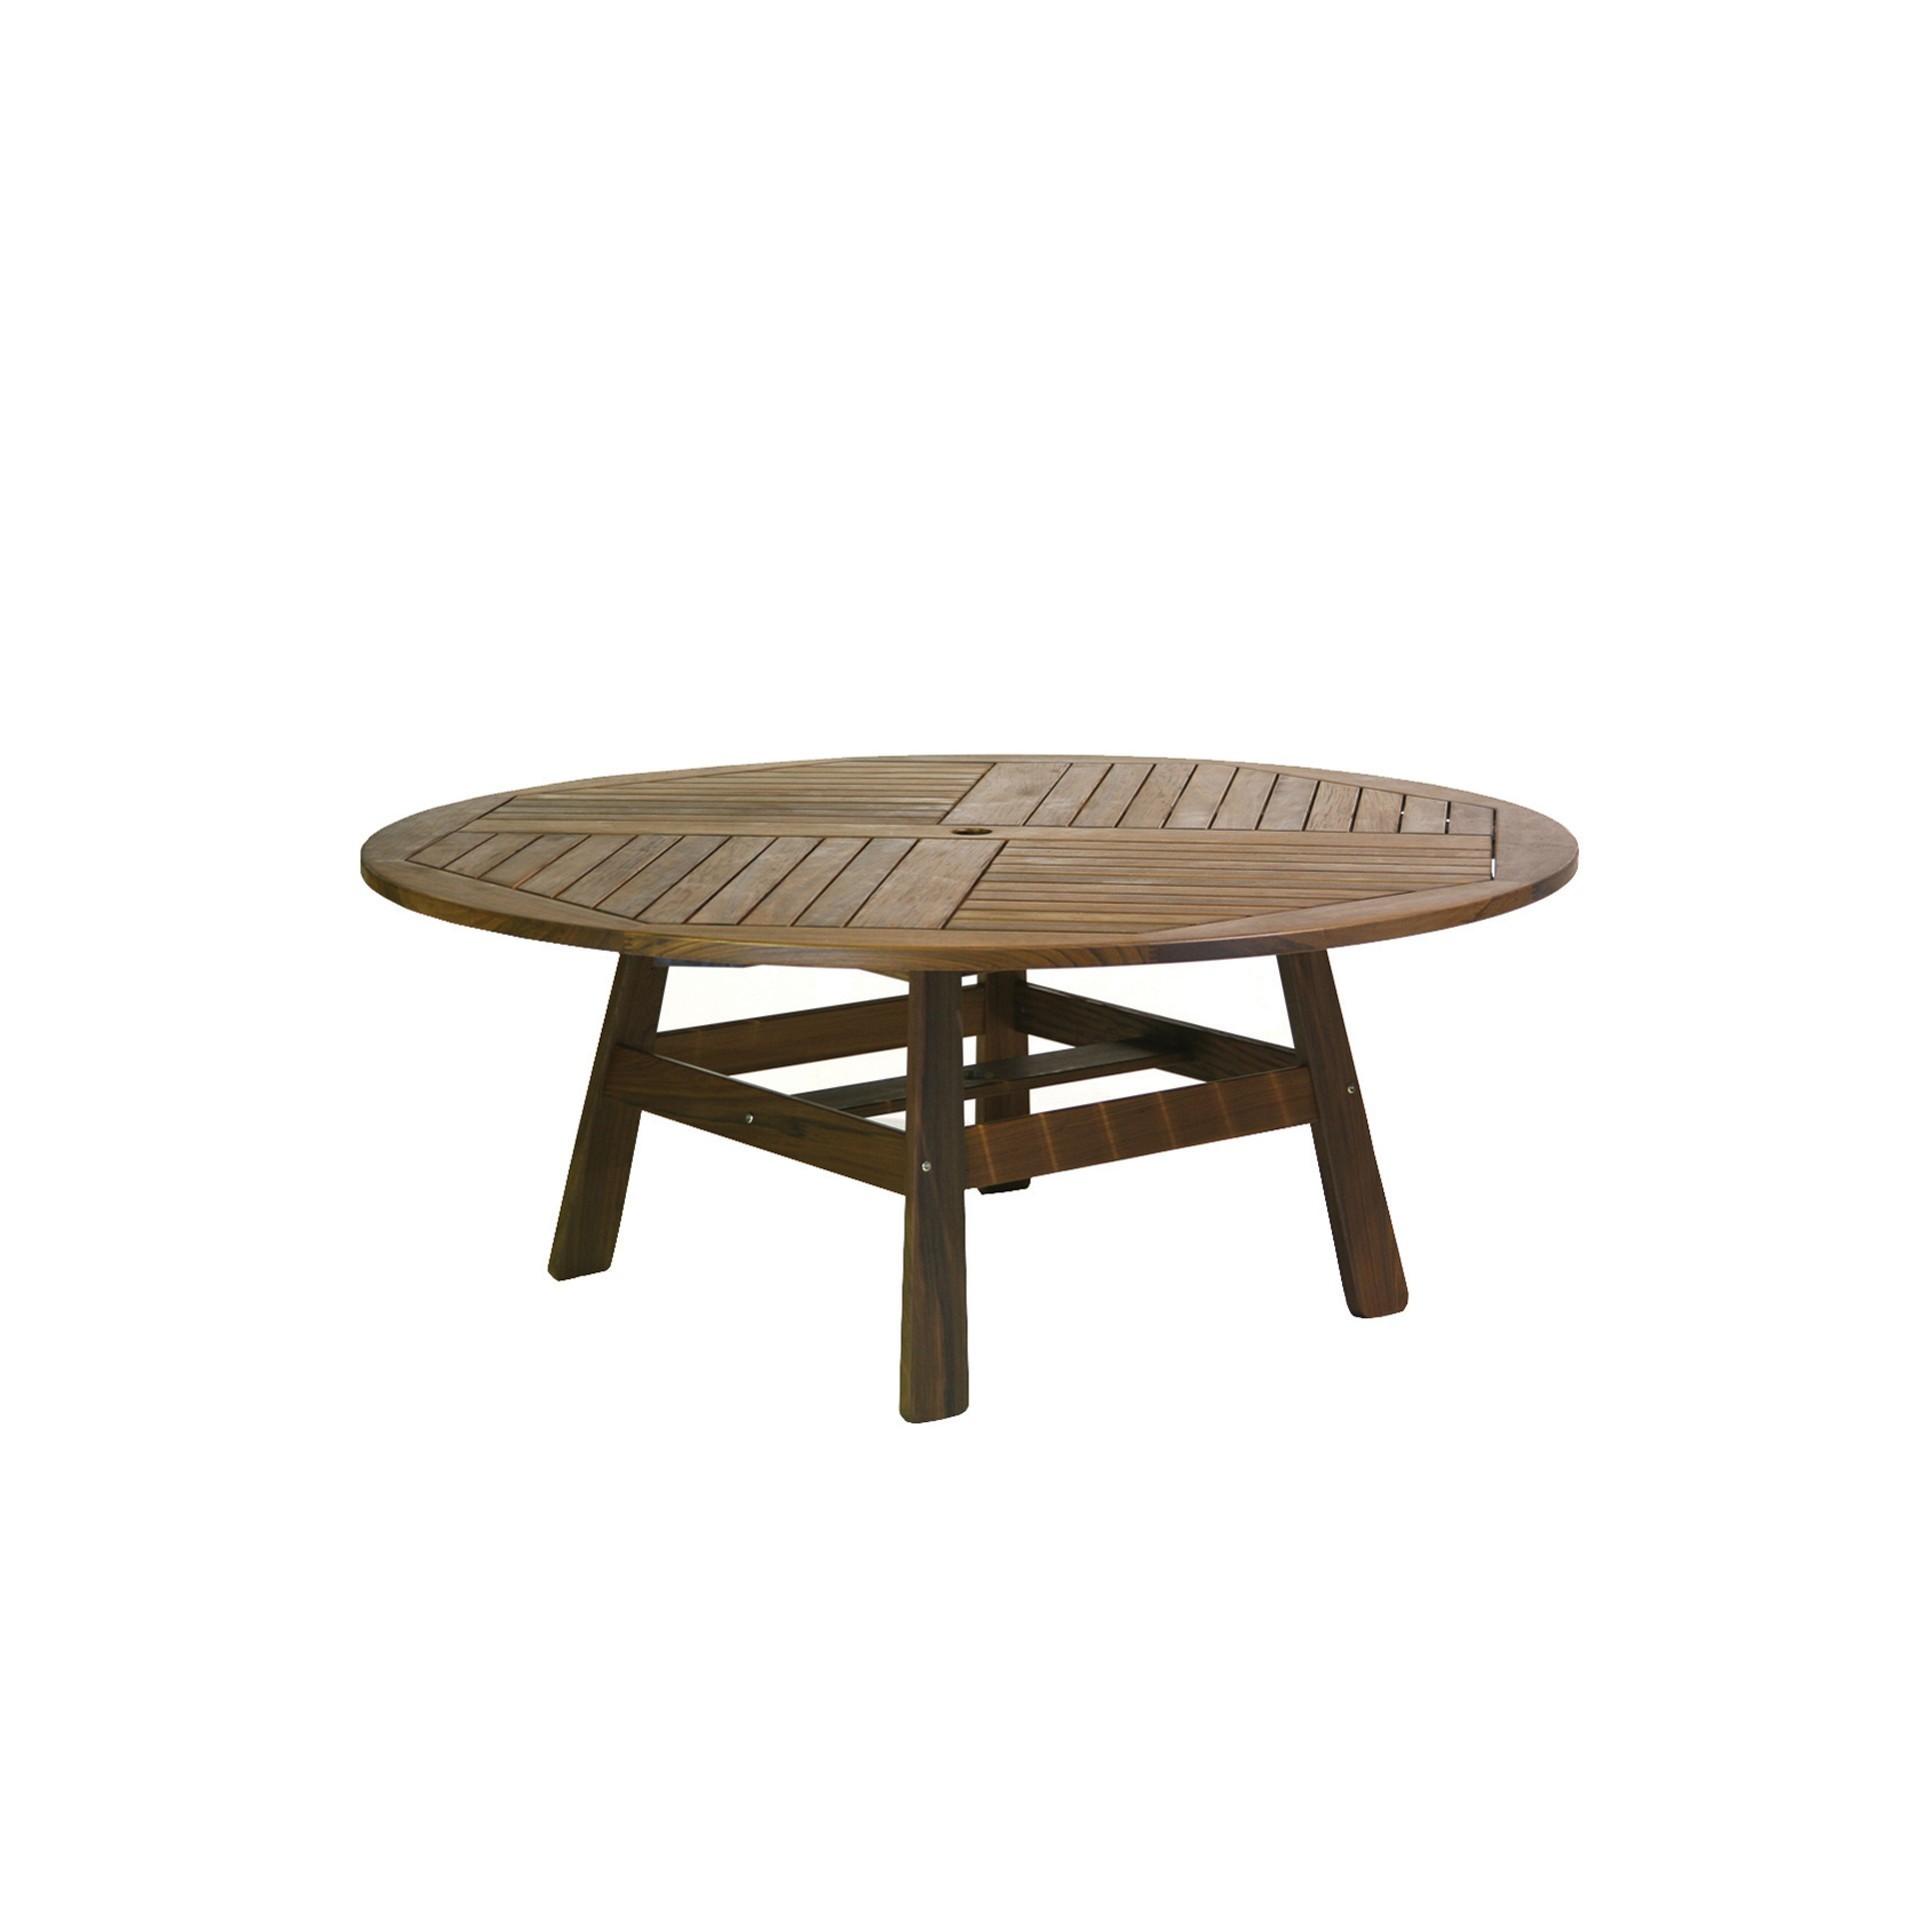 Pemberton Table 70 Quot Round Hauser S Patio